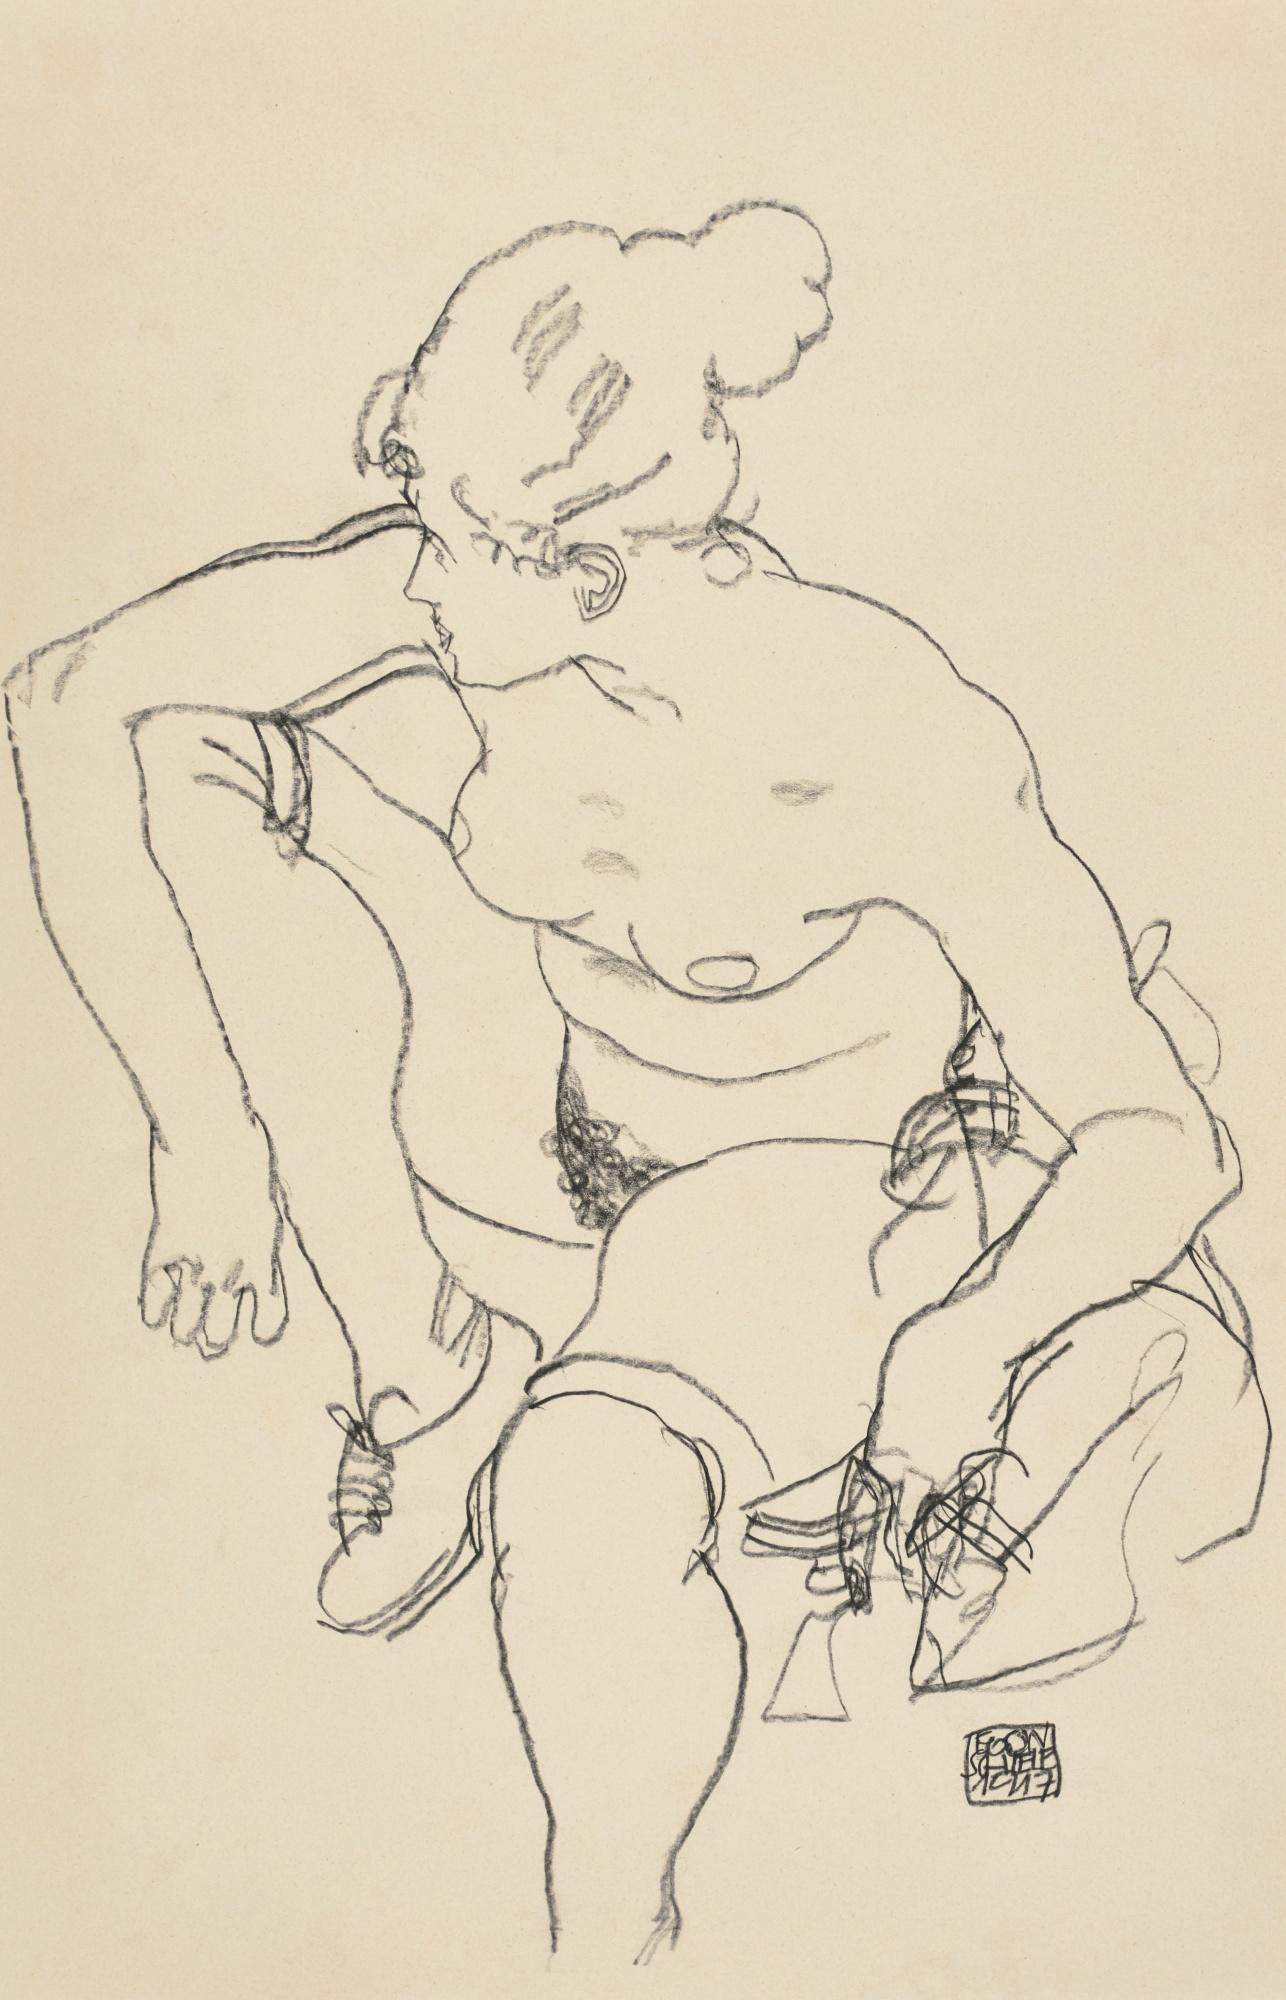 Egon Schiele-Frau Sitzend Mit Schuhen (Woman Seated With Shoes)-1917